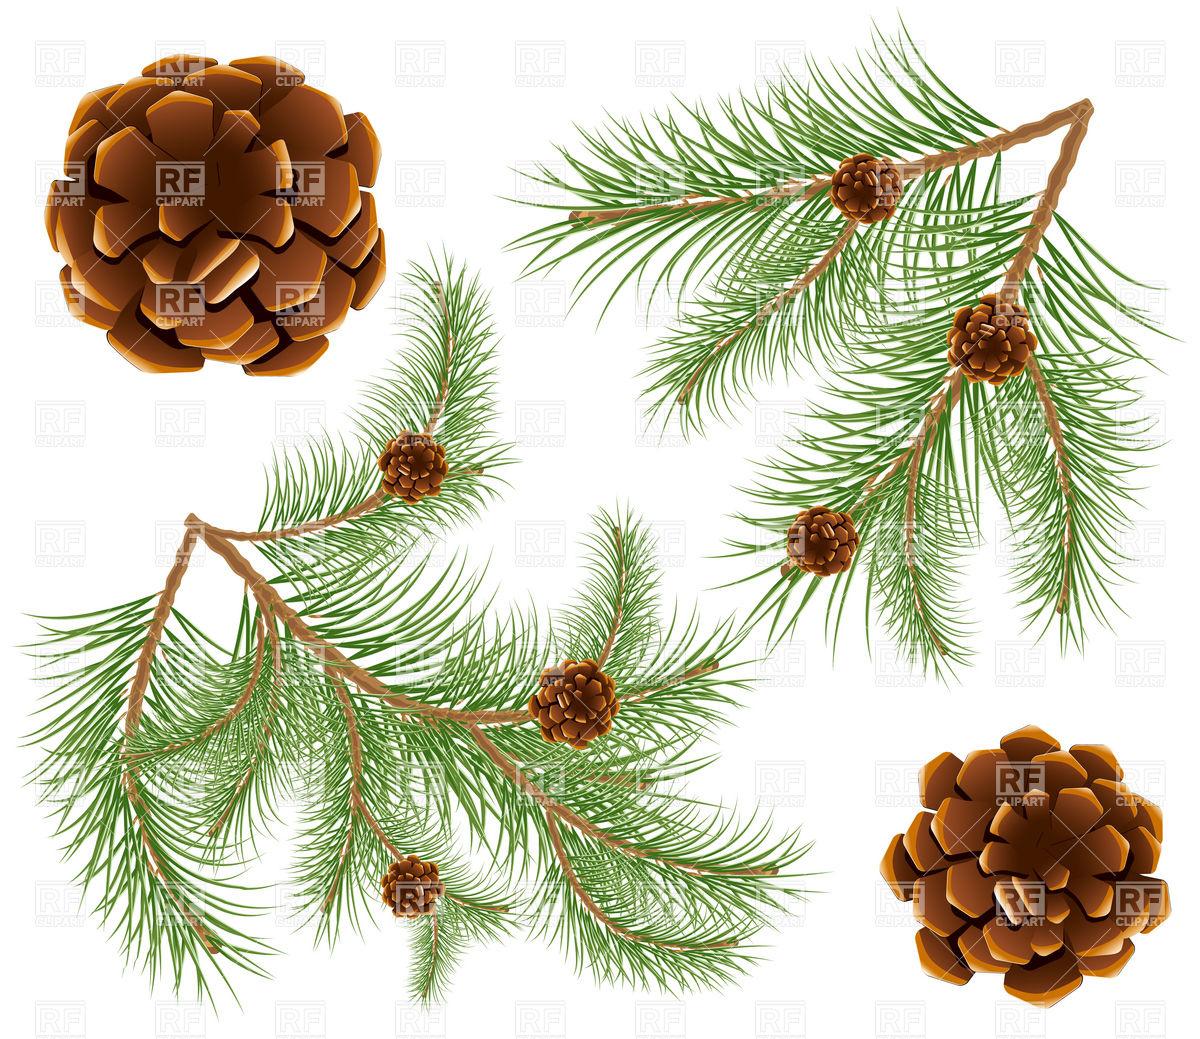 1200x1039 Pine Cones With Pine Needles Twig Vector Image Vector Artwork Of